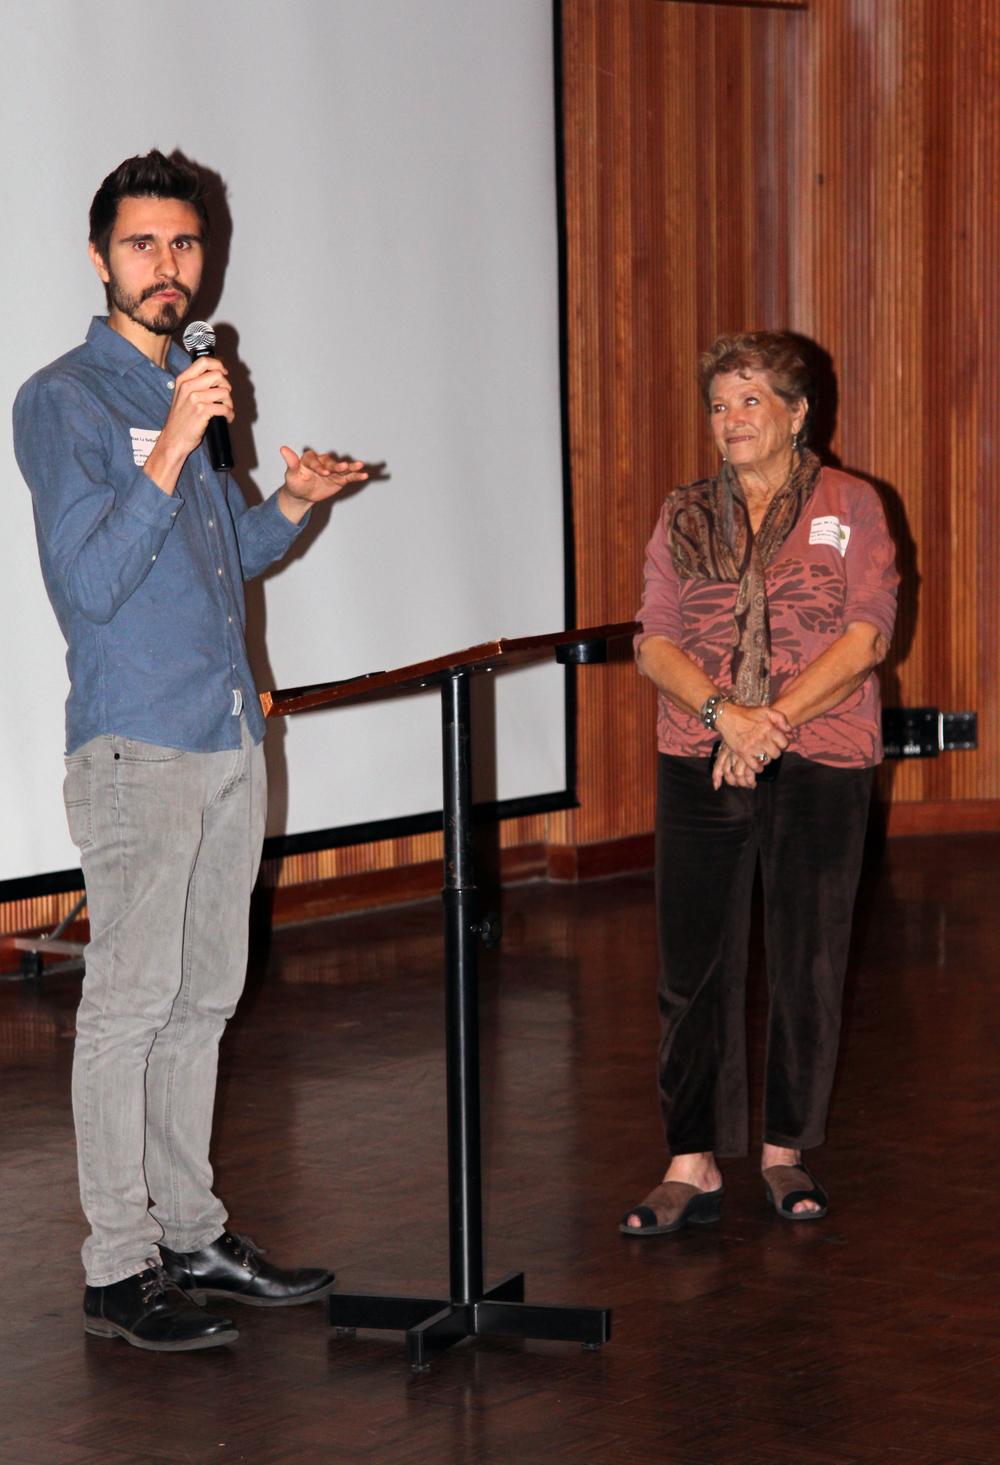 Dan La Bellearte and Julie McLeod